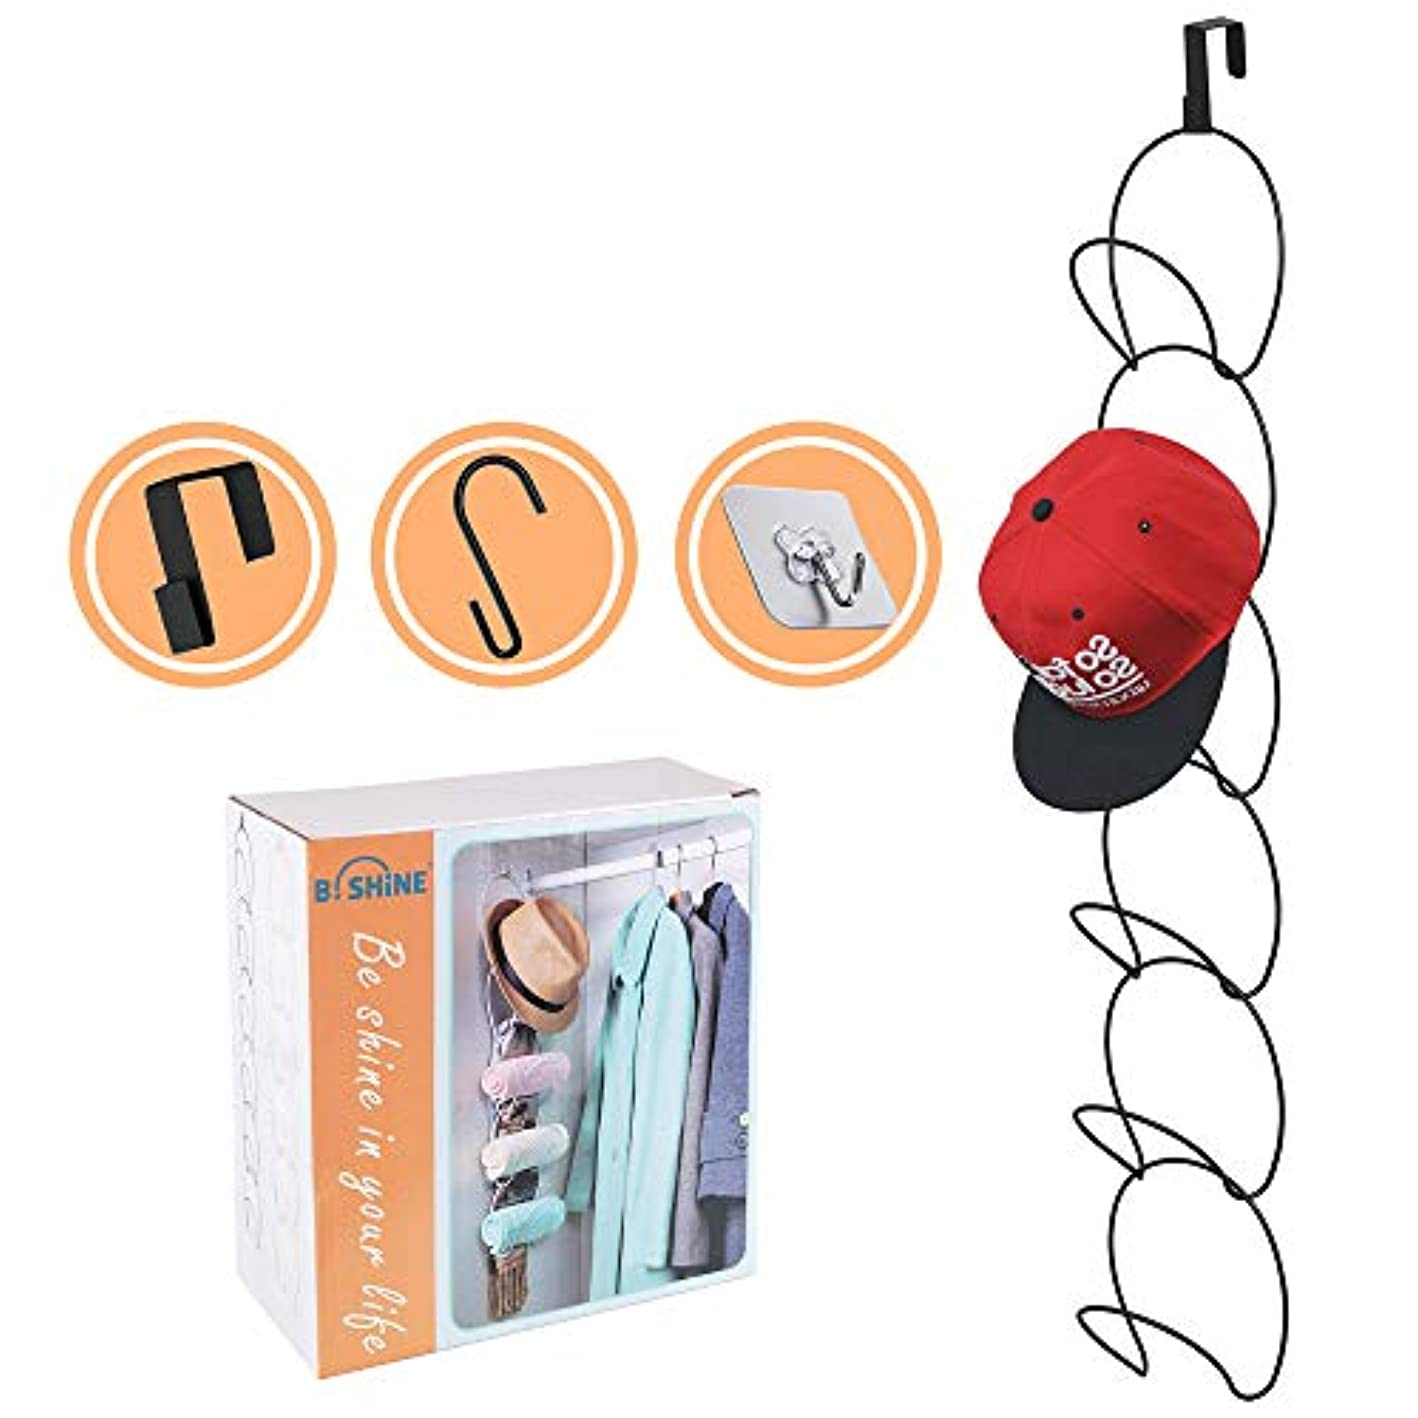 B. SHINE Cap Rack Hat Organizer – Hanging Caps Hats Scarfs Organizer Rack, 6/8 Rings Multifunctional Door/Wall/Closet Mounted Racks